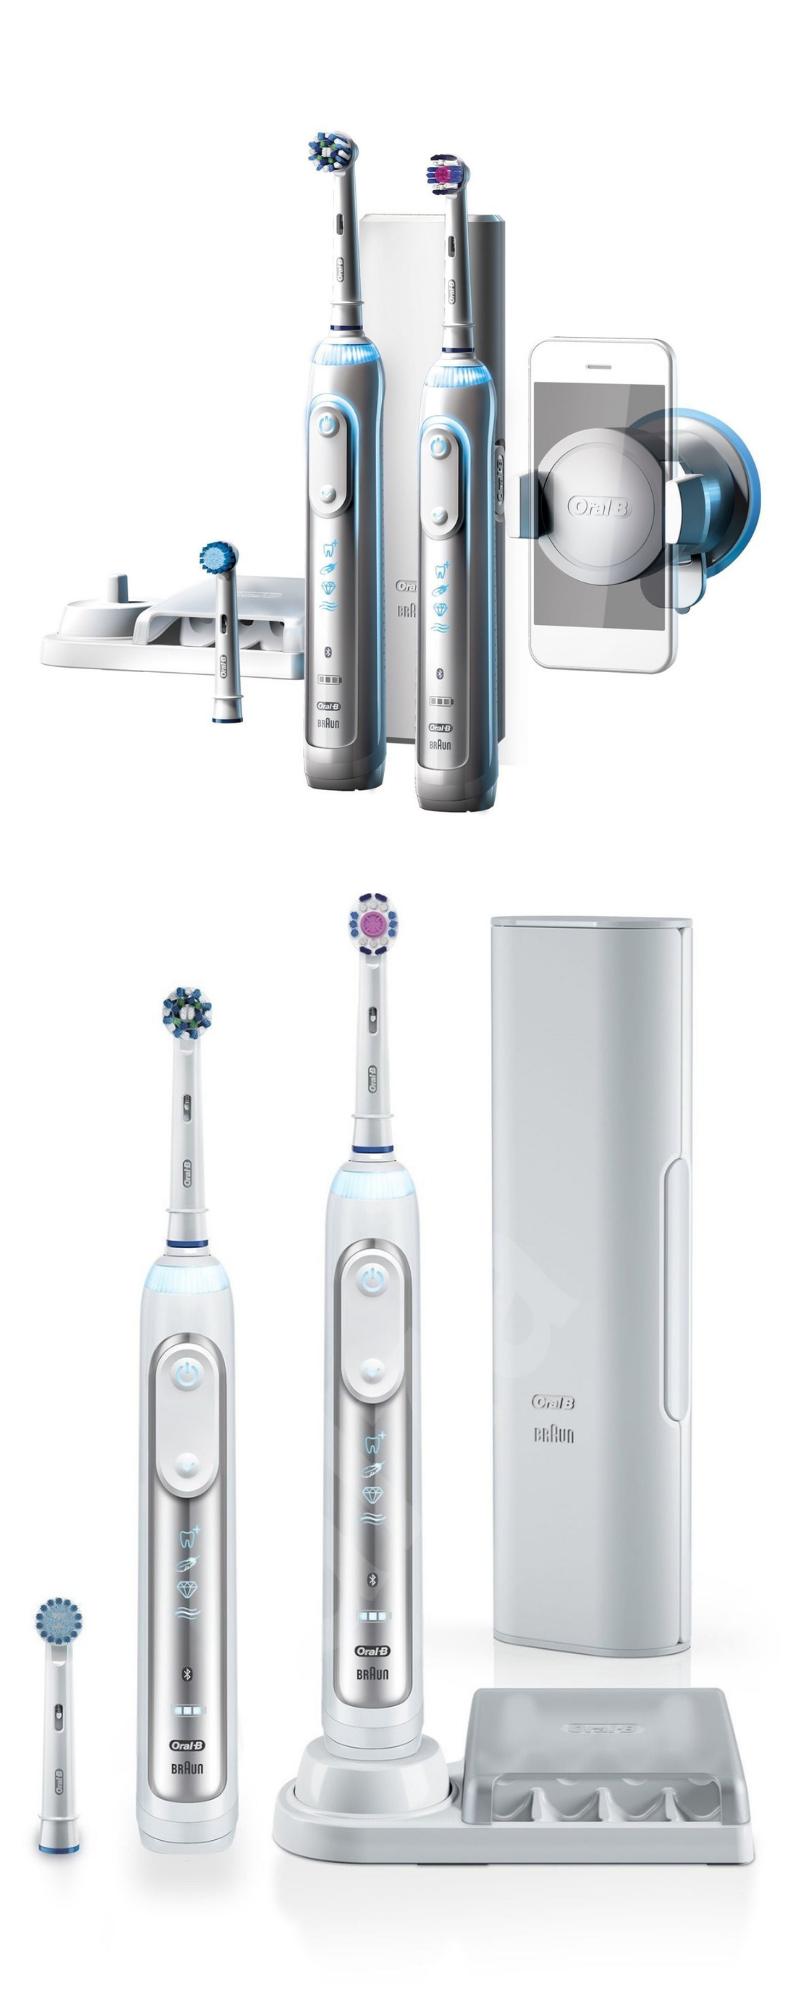 Oral B Genius Pro 8900 Crossaction Electric Rechargeable Toothbrush Rechargeable Toothbrush Oral B Brushing Teeth